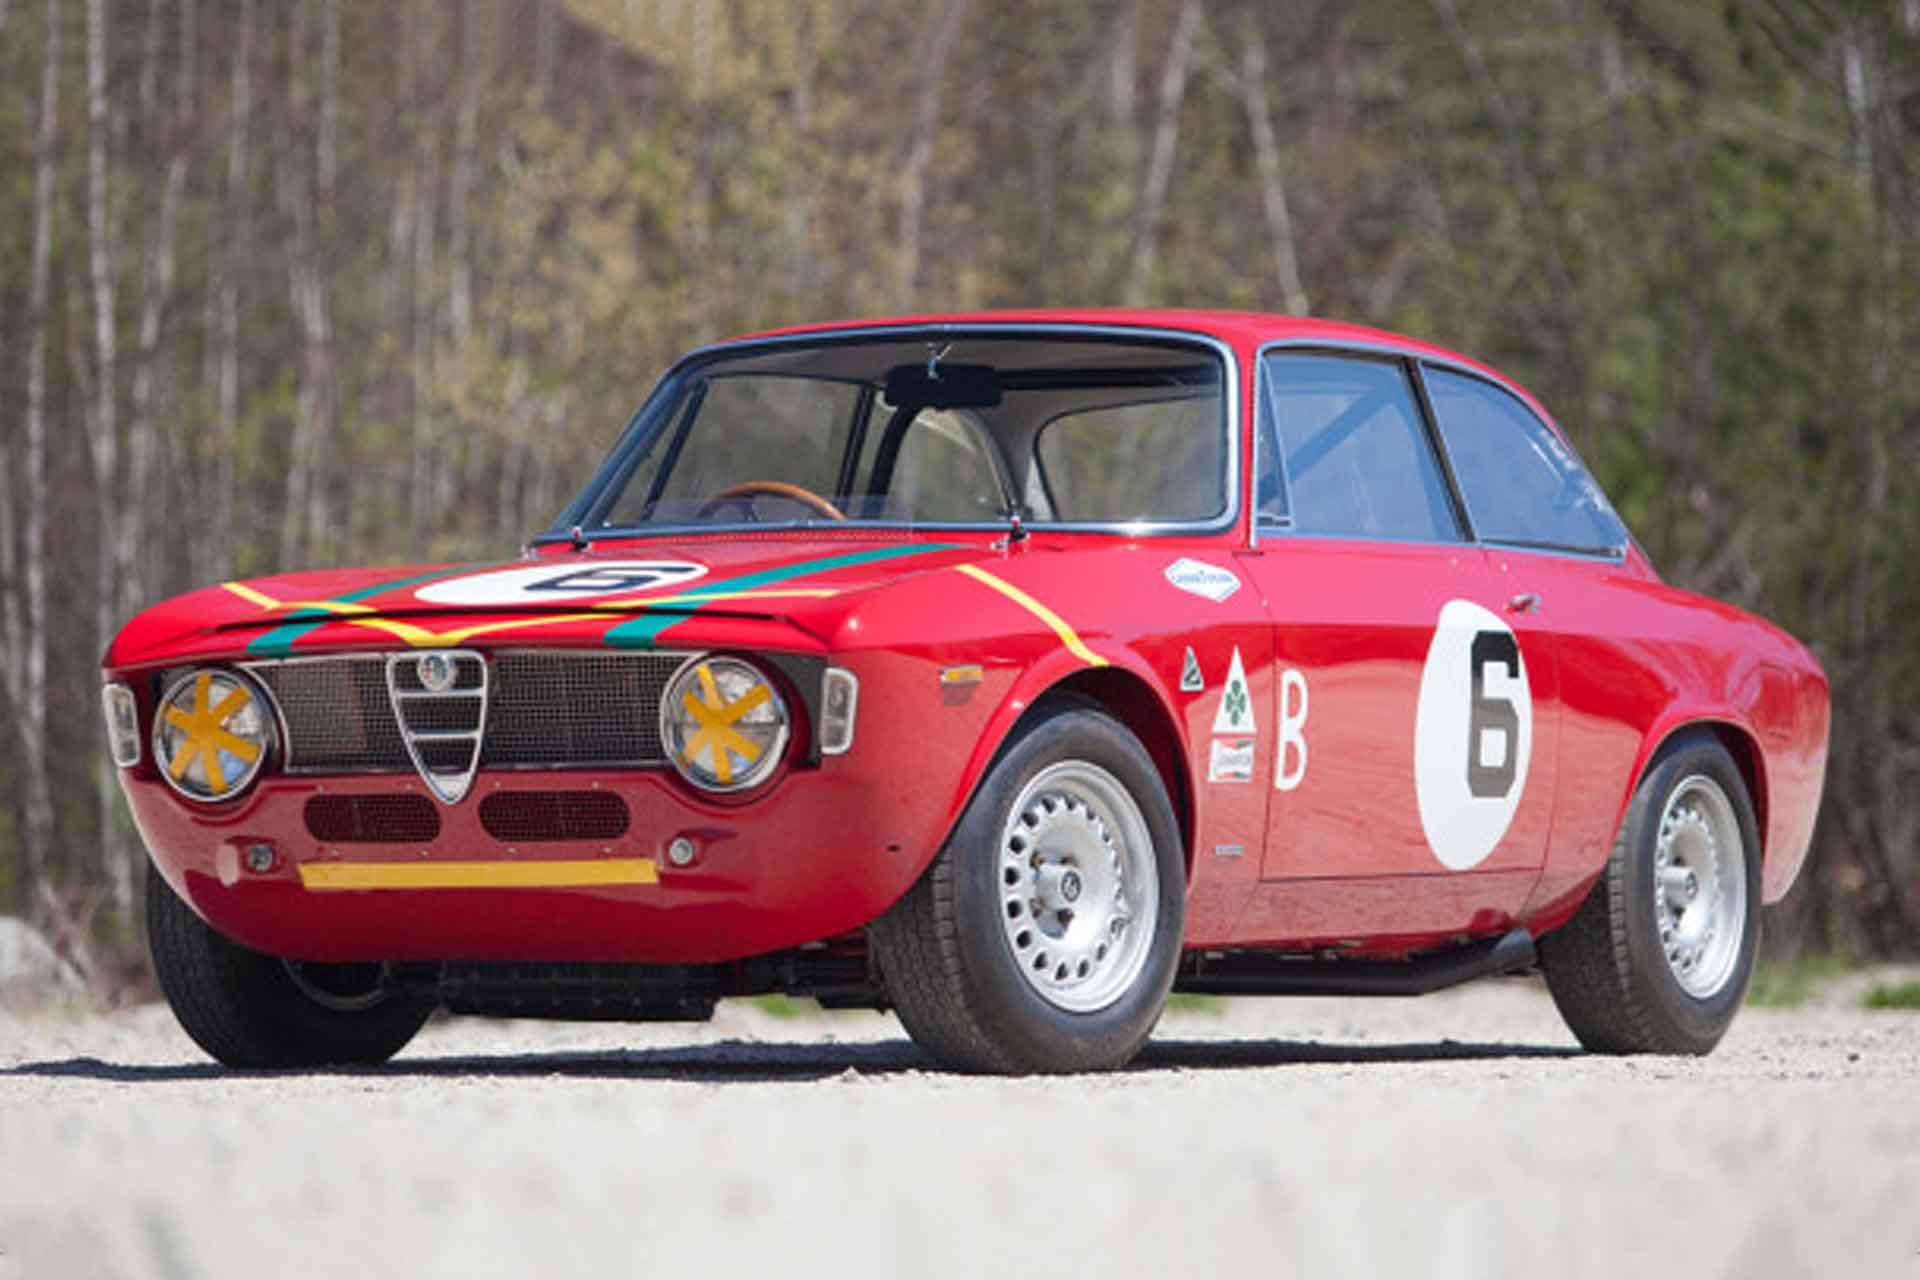 1966 Alfa Romeo Giulia Sprint Gta Coupe Uncrate